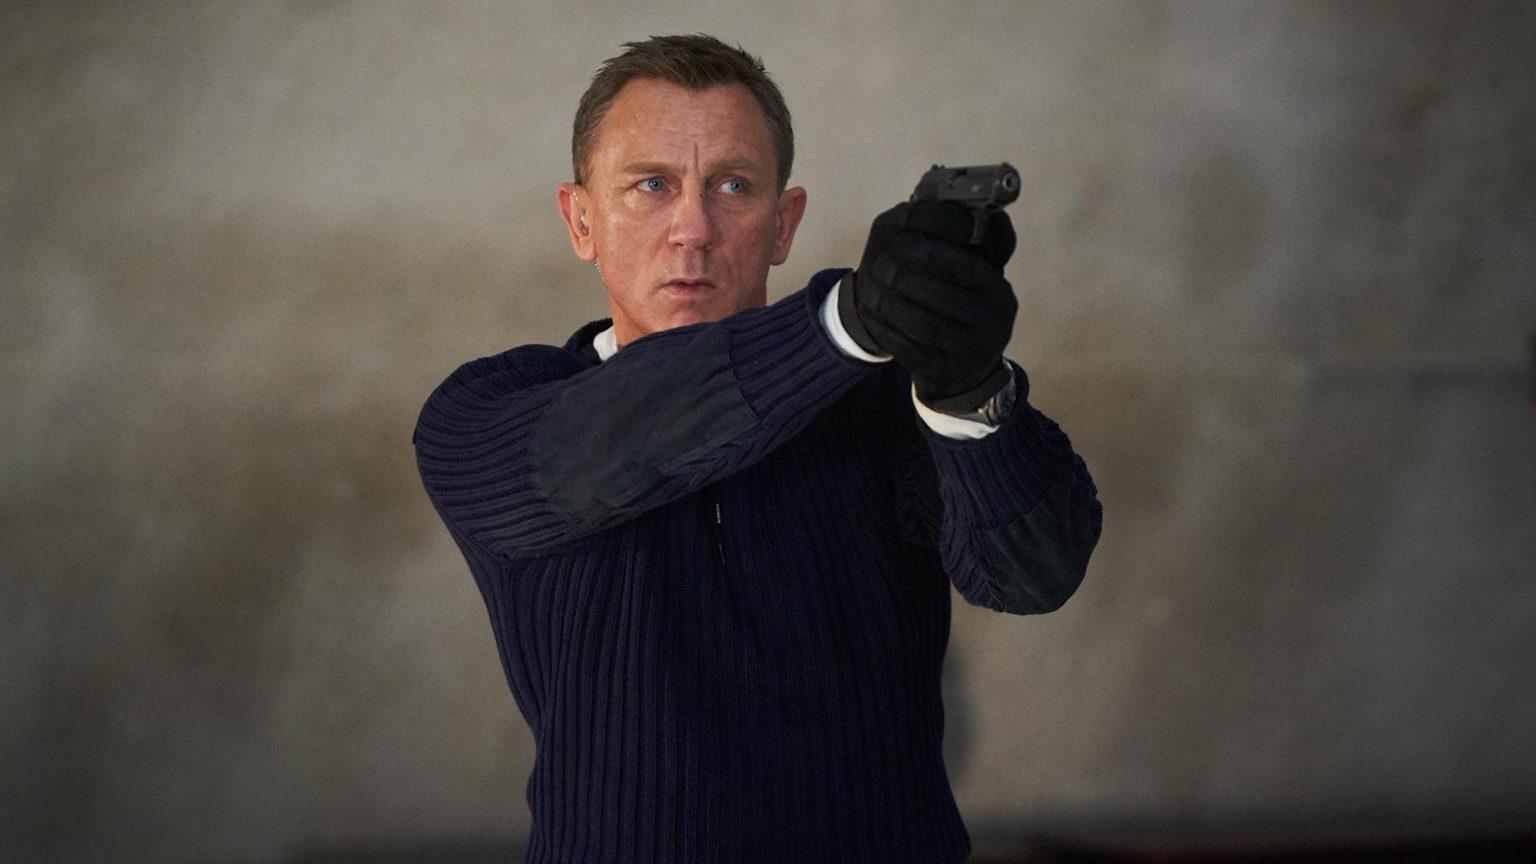 Do we really need Bond films that <em>say something</em>?